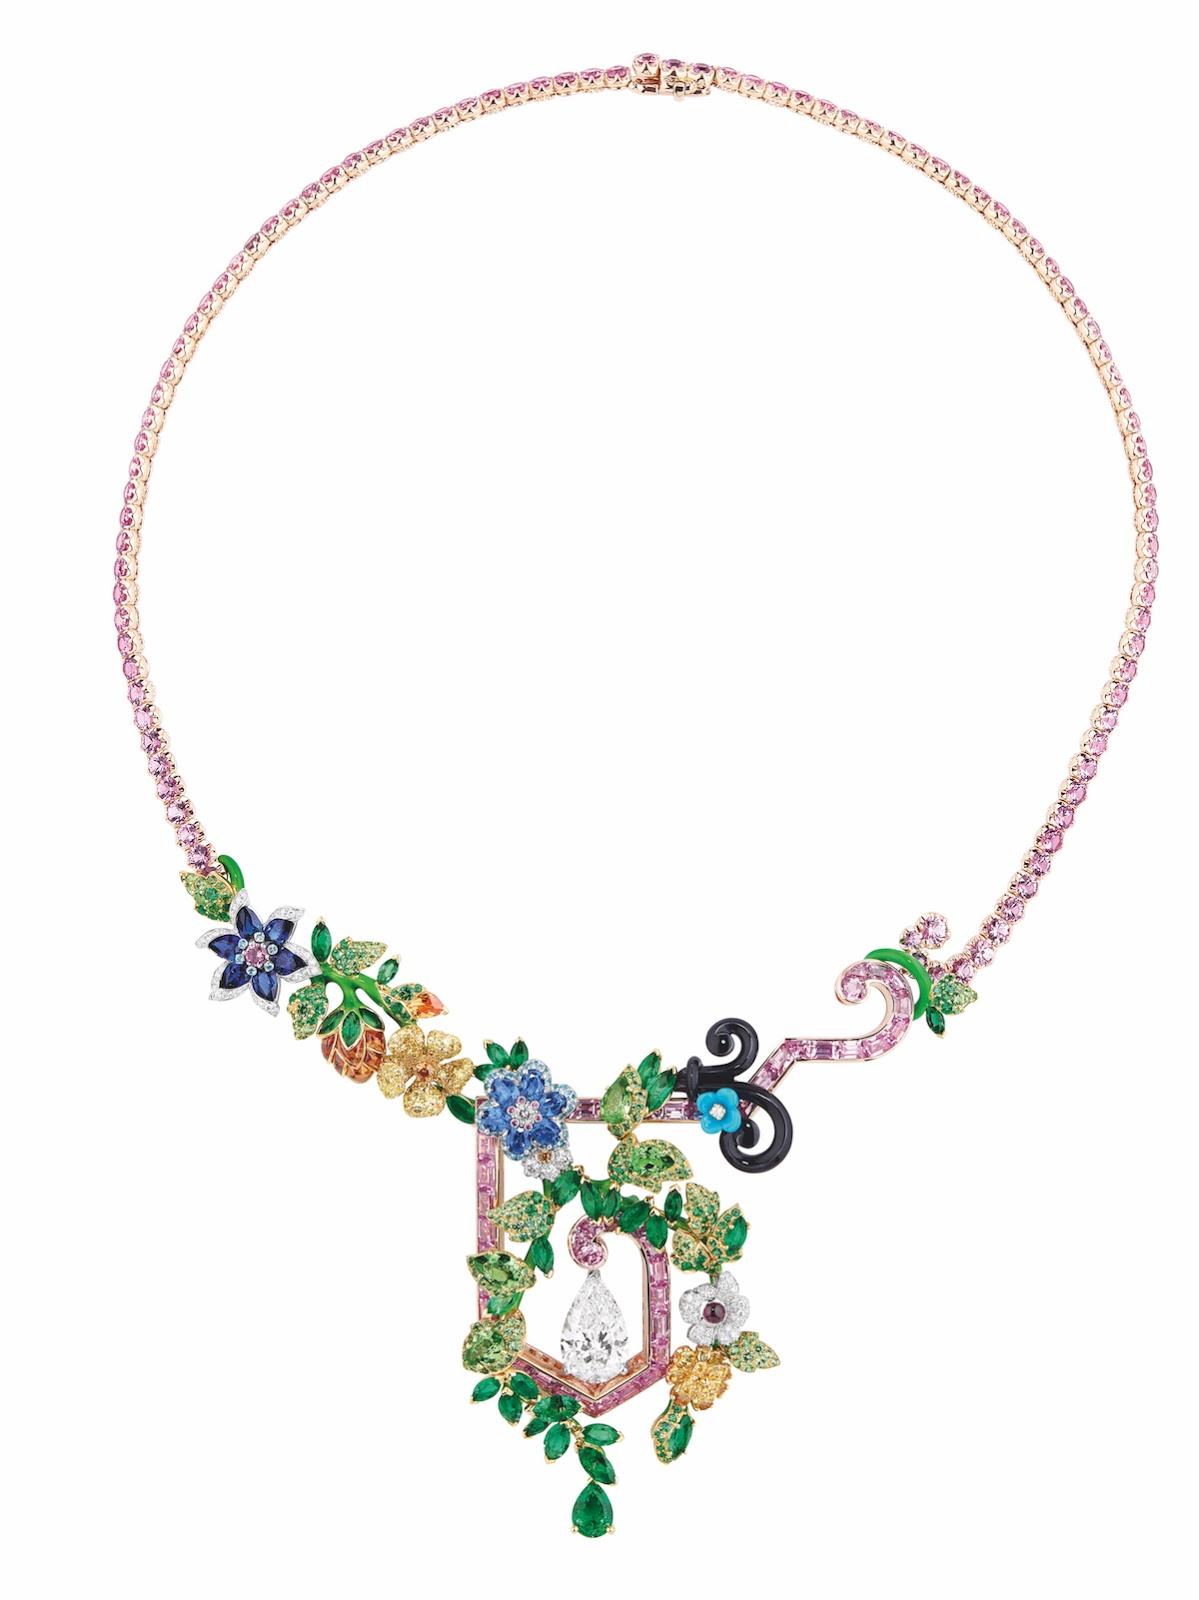 Dior A Versailles, Cote Jardins, Fine Jewellery Collection